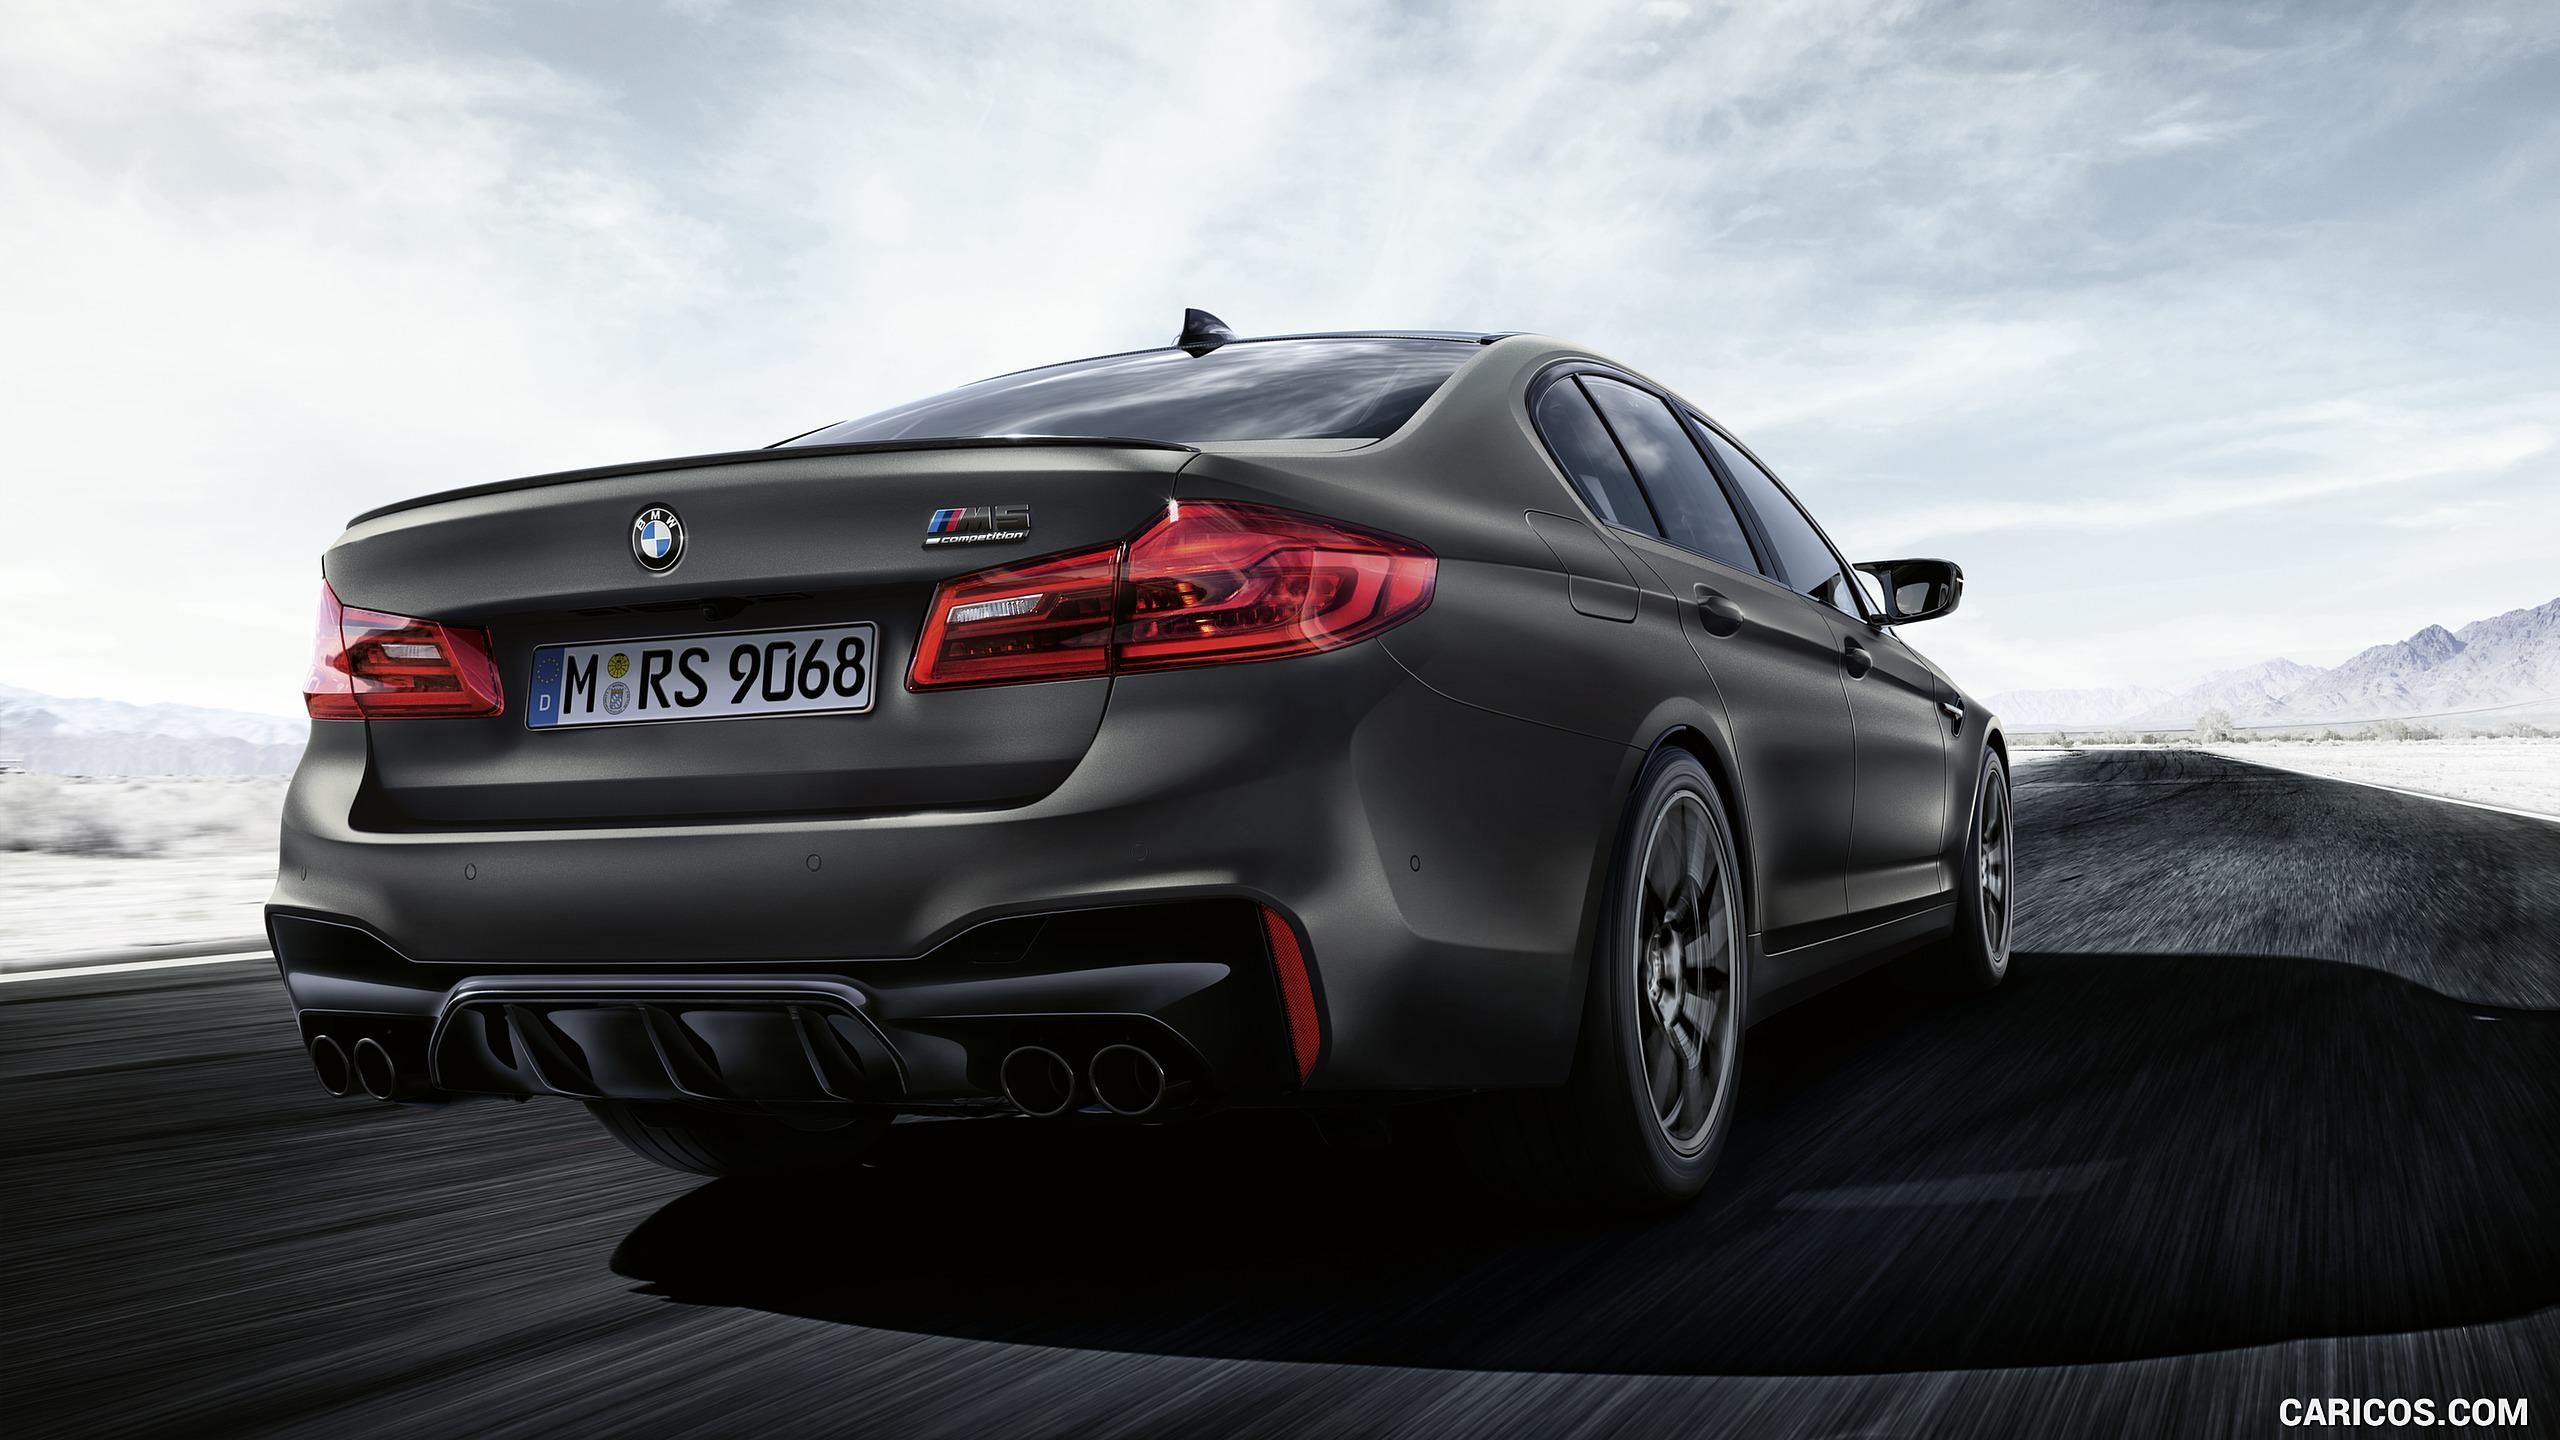 2020 BMW M5 Edition 35 Years   Rear Three Quarter HD Wallpaper 4 2560x1440